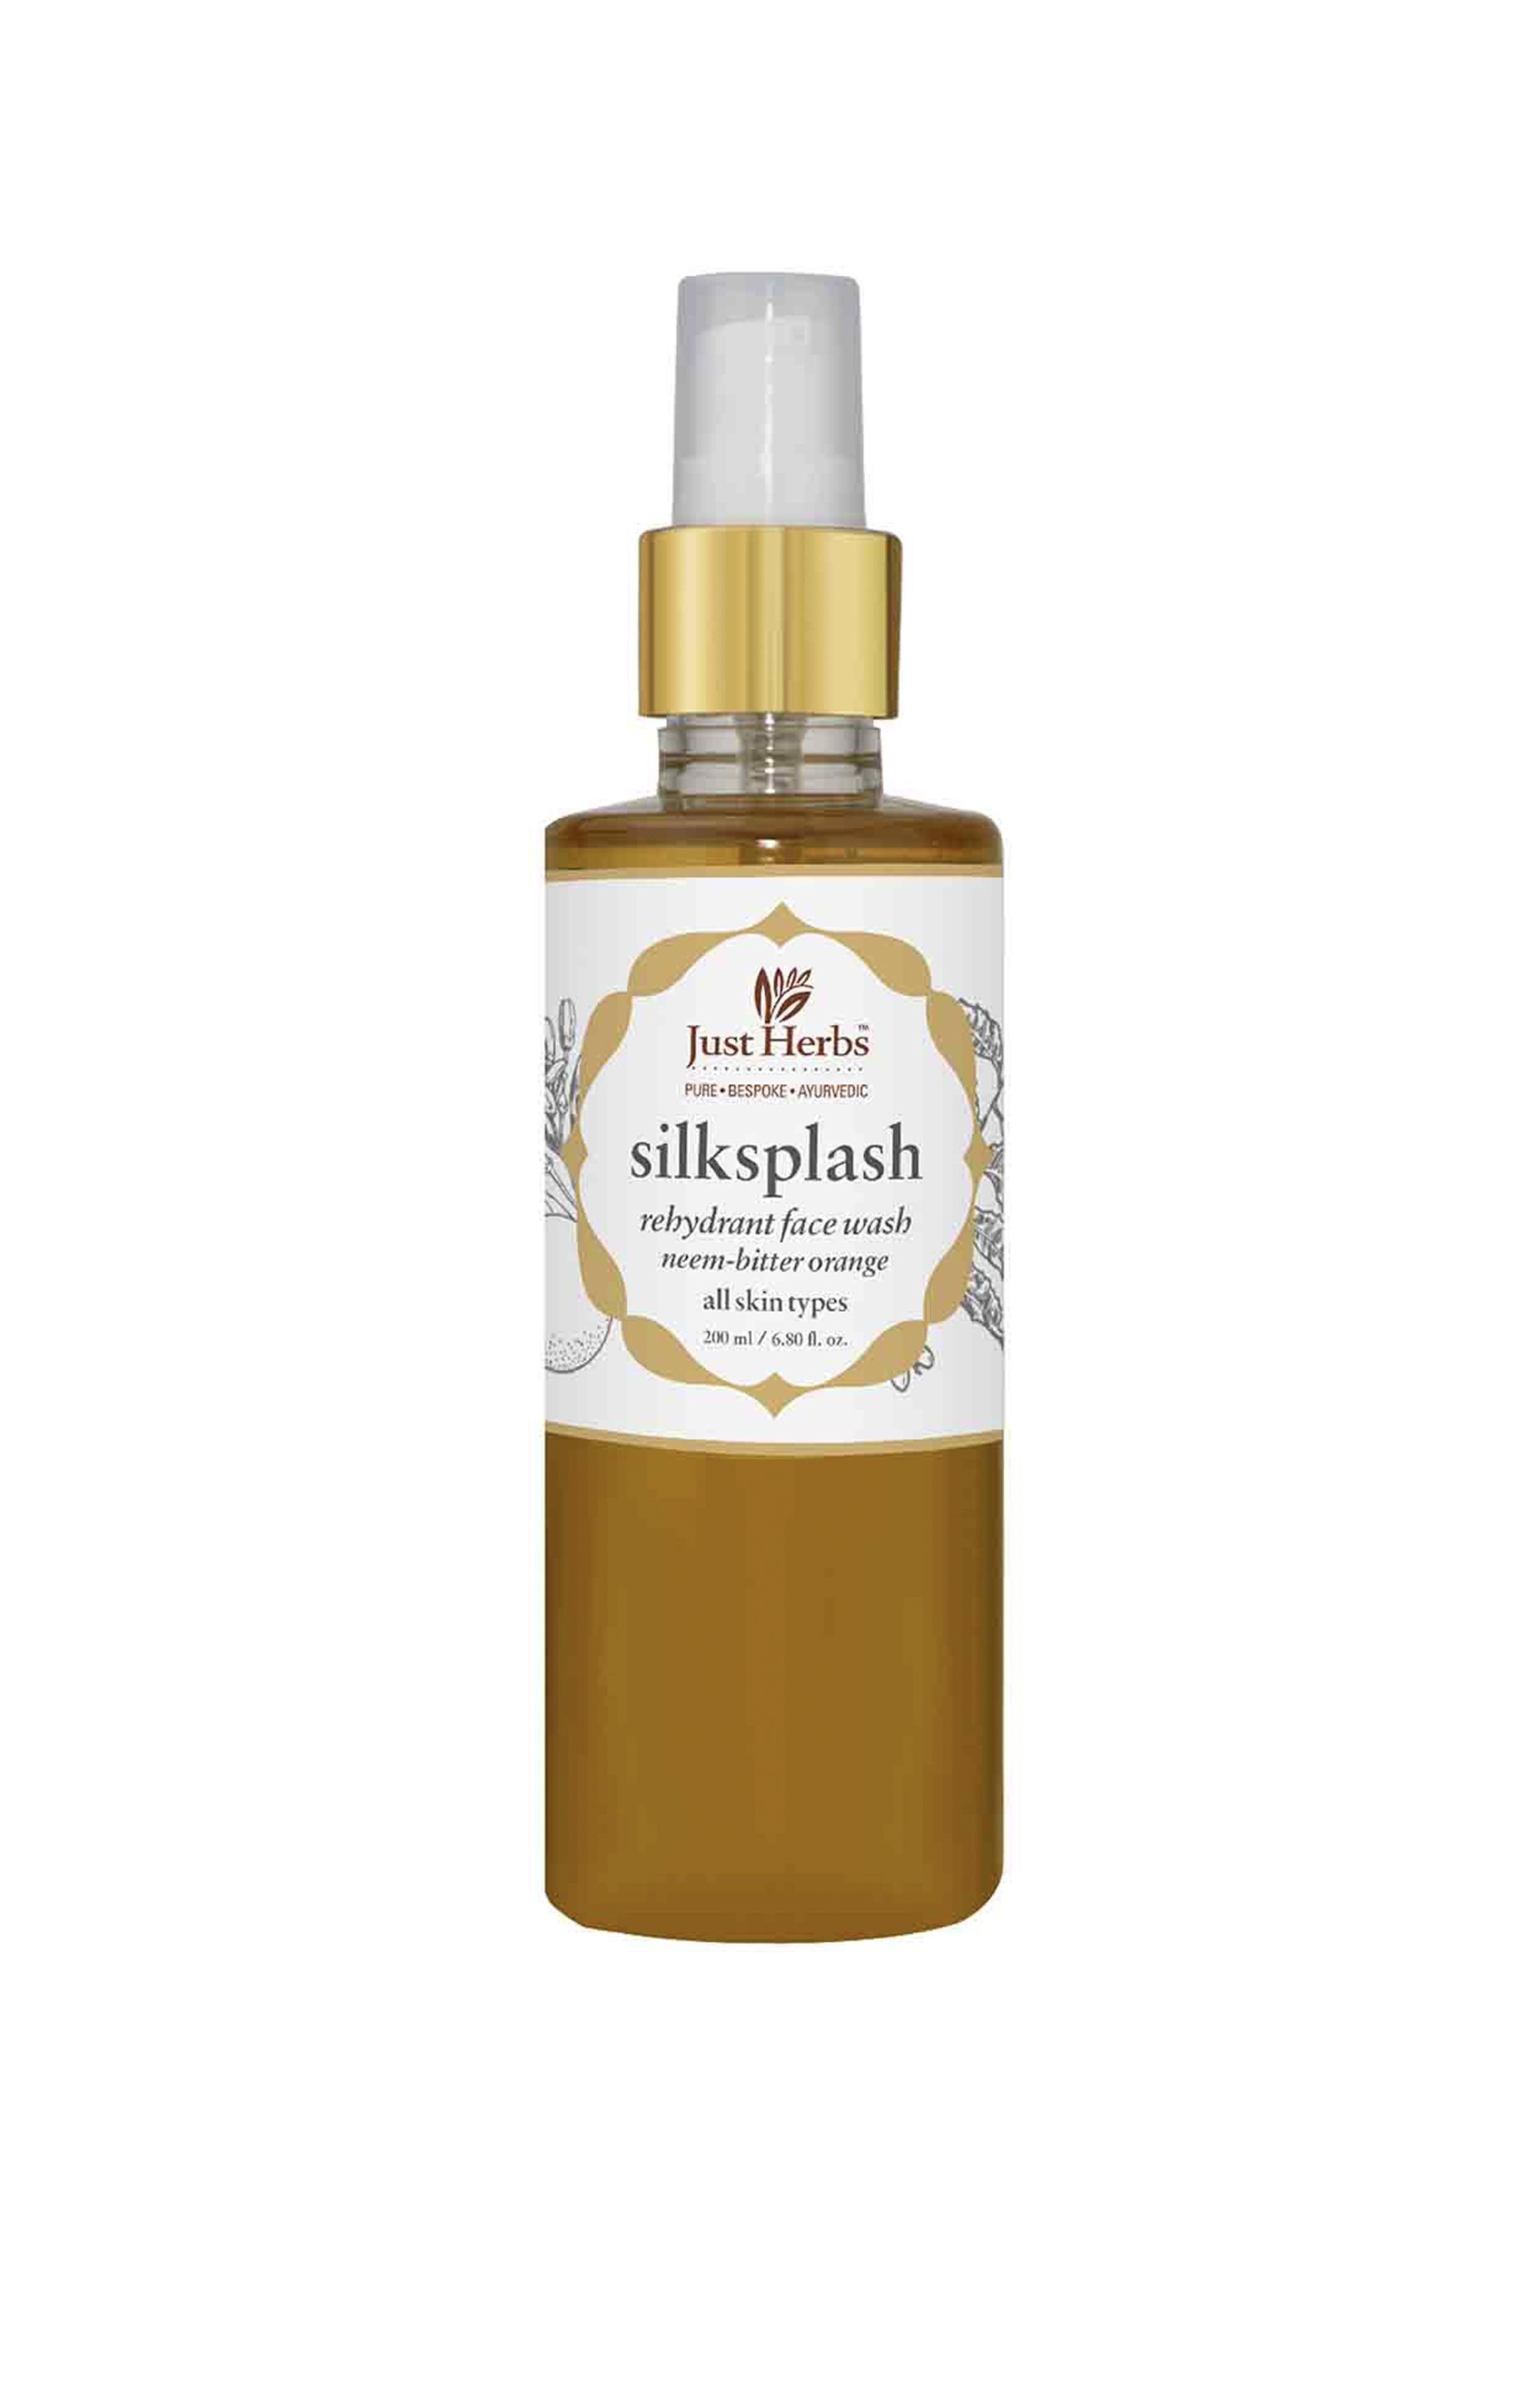 Just Herbs | Silksplash Rehydrant Face Wash 200ml